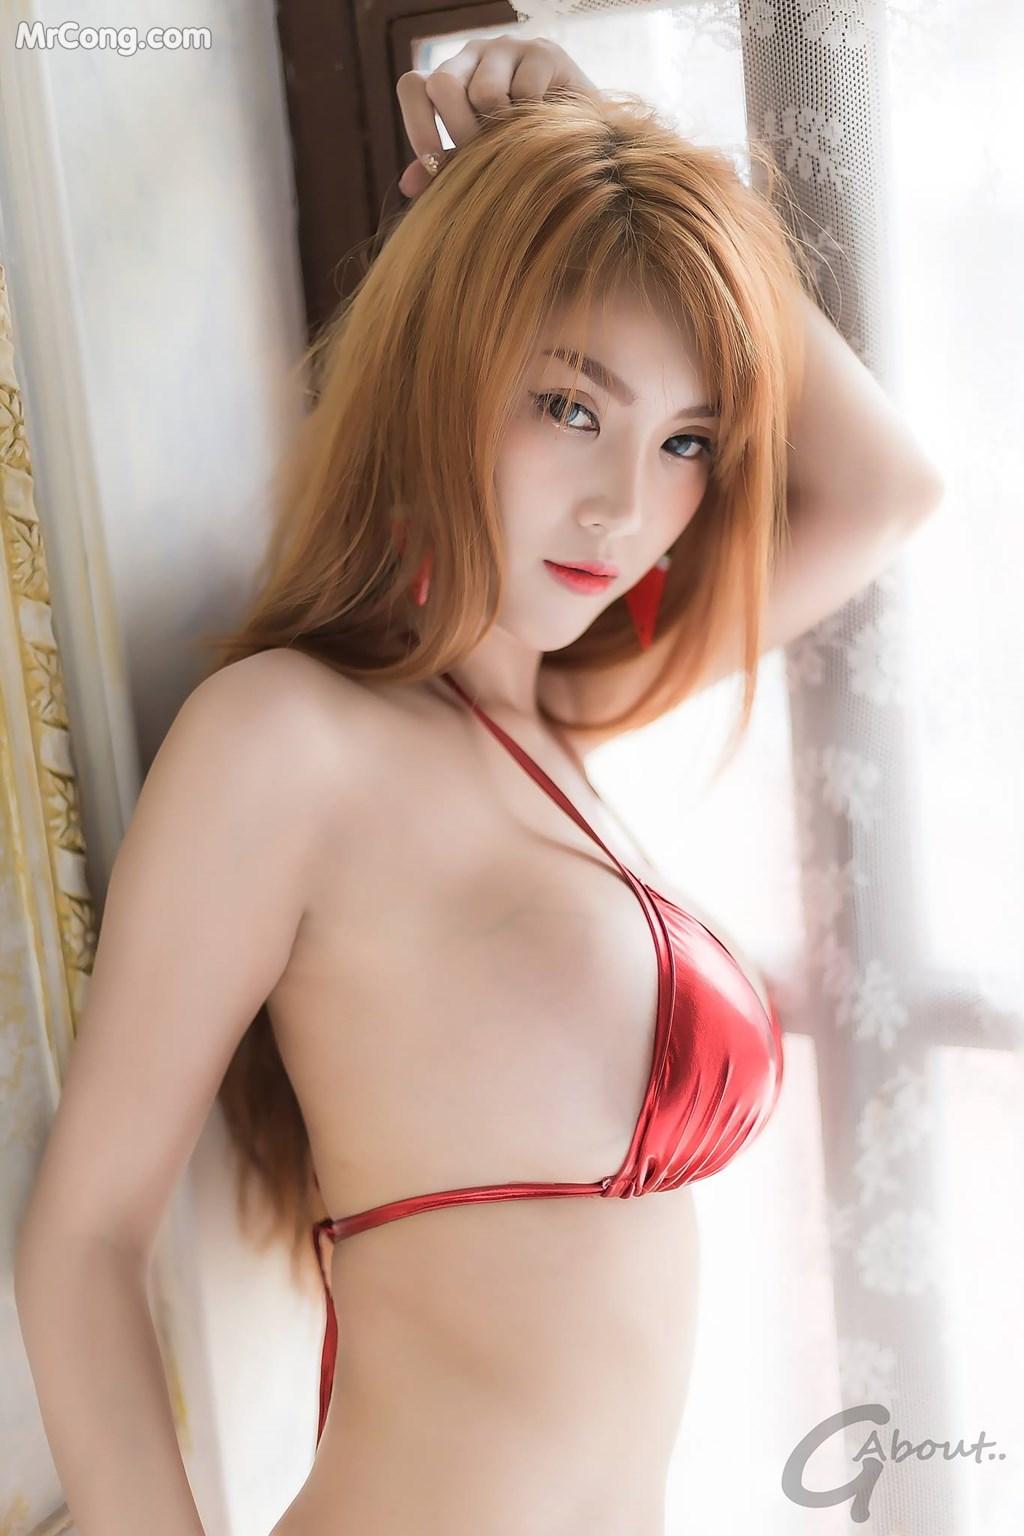 Image Thai-Model-No.482-Alisa-Rattanachawangkul-MrCong.com-007 in post Thai Model No.482: Người mẫu Alisa Rattanachawangkul (9 ảnh)